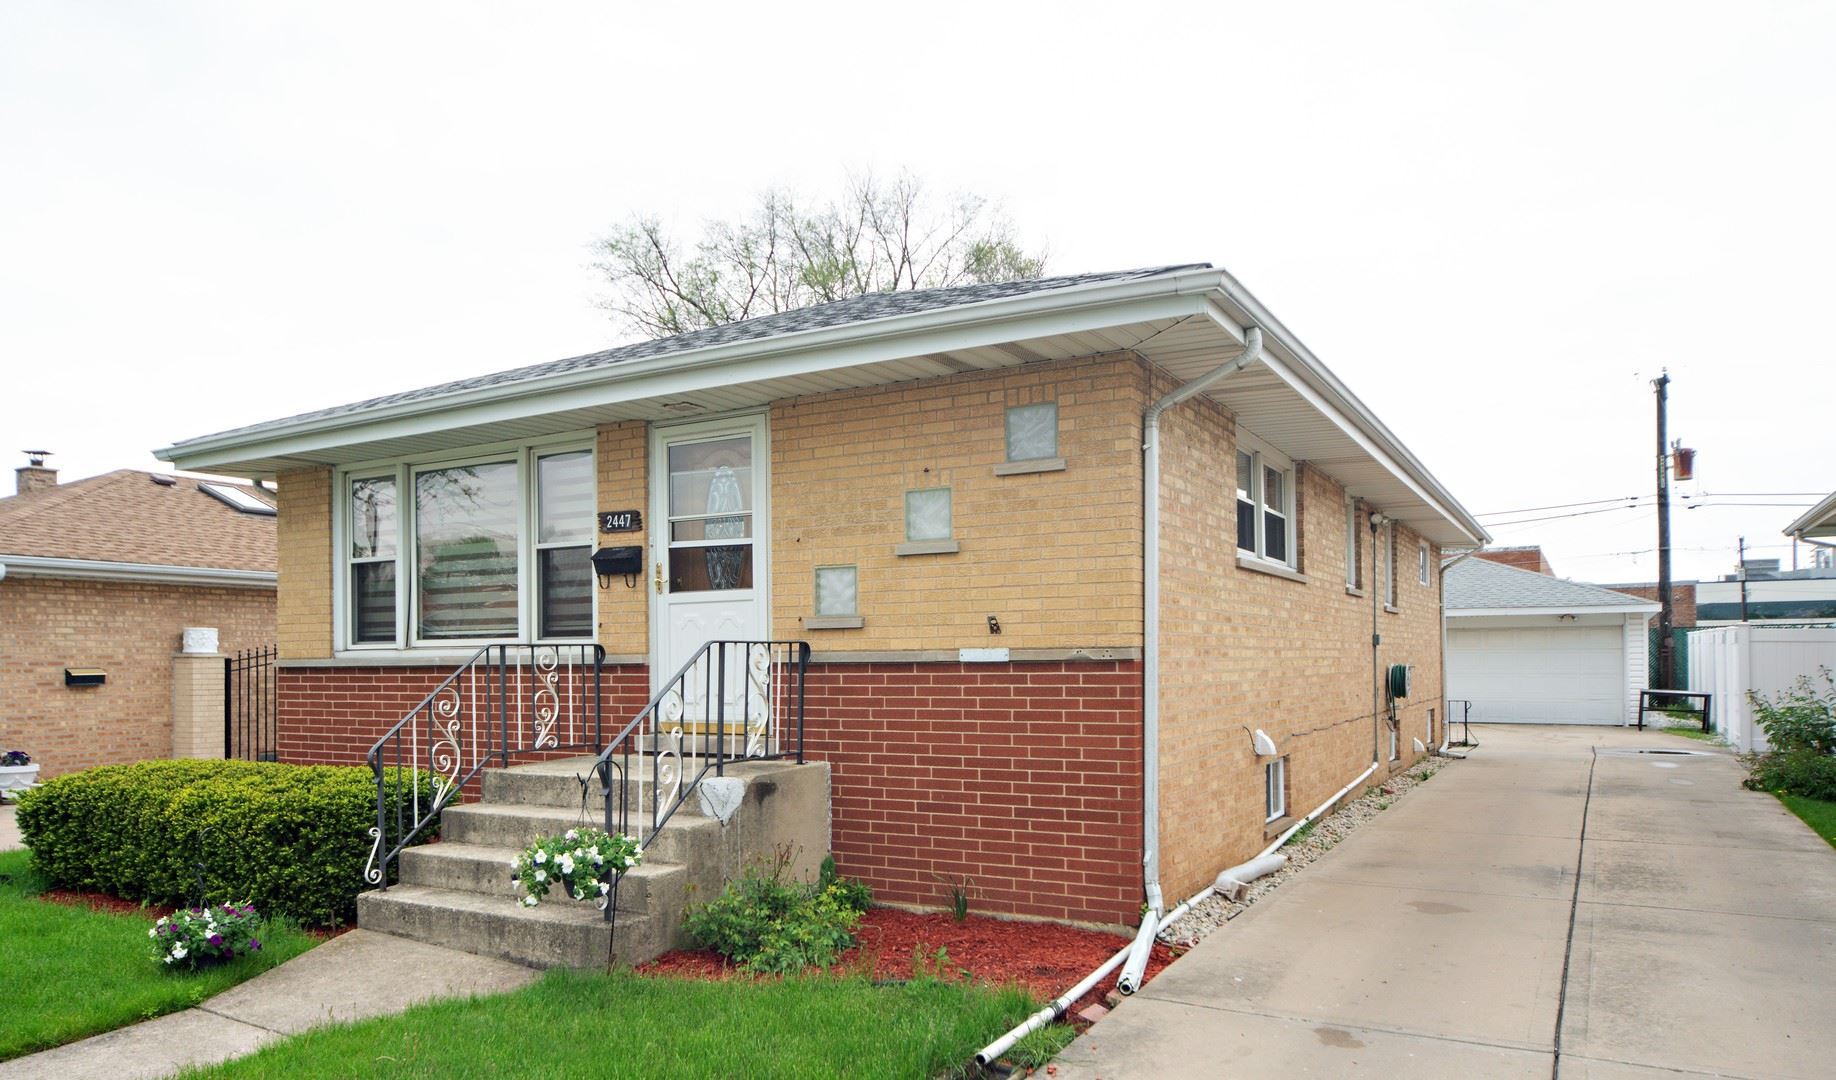 2447 SHEILA Street, Franklin Park, IL 60131 - #: 10720064